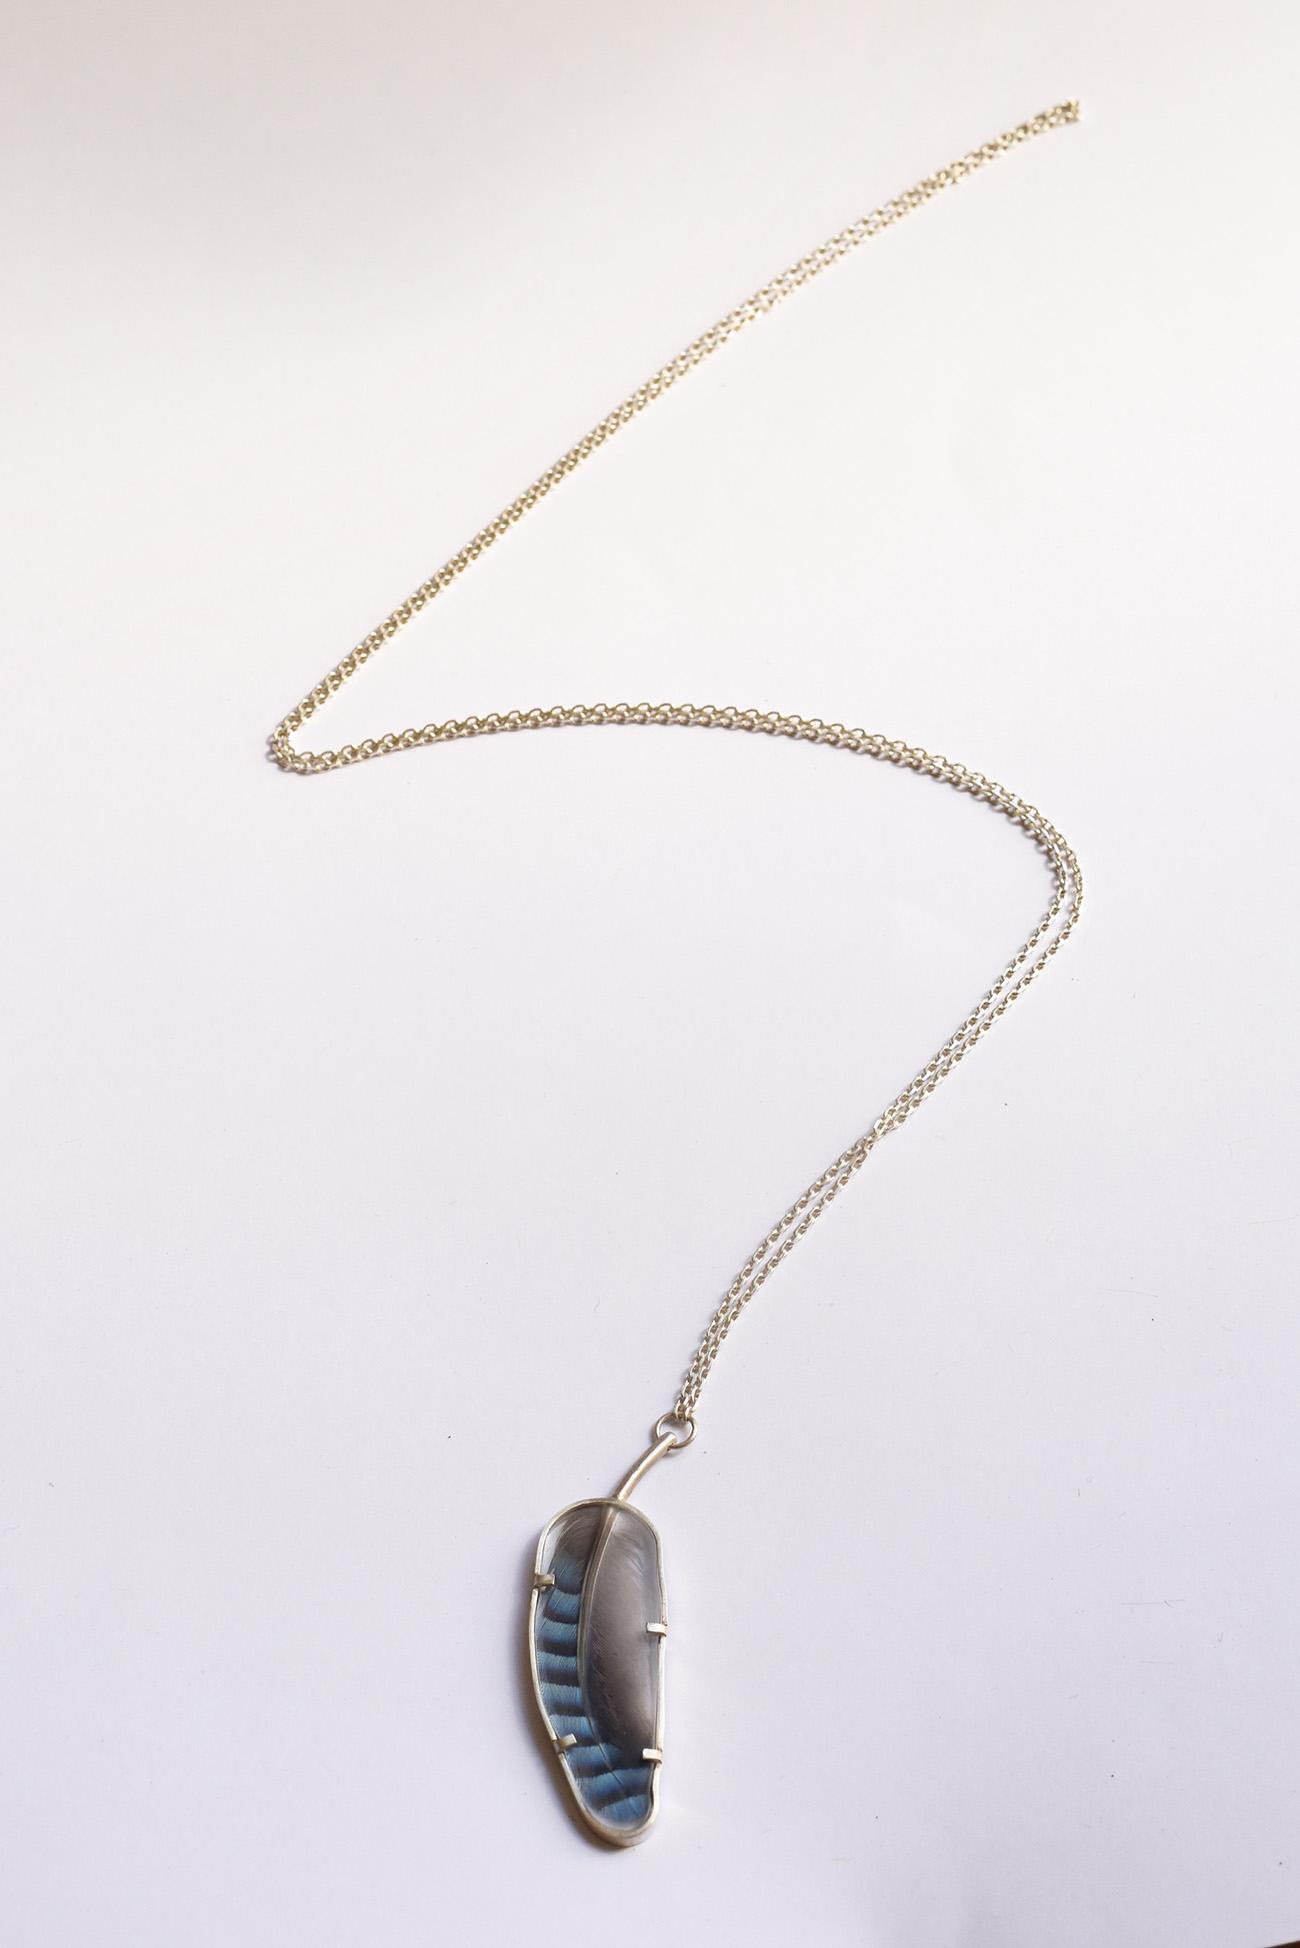 Nicolas' signs, plexiglass, jaybird feather and silver pendant